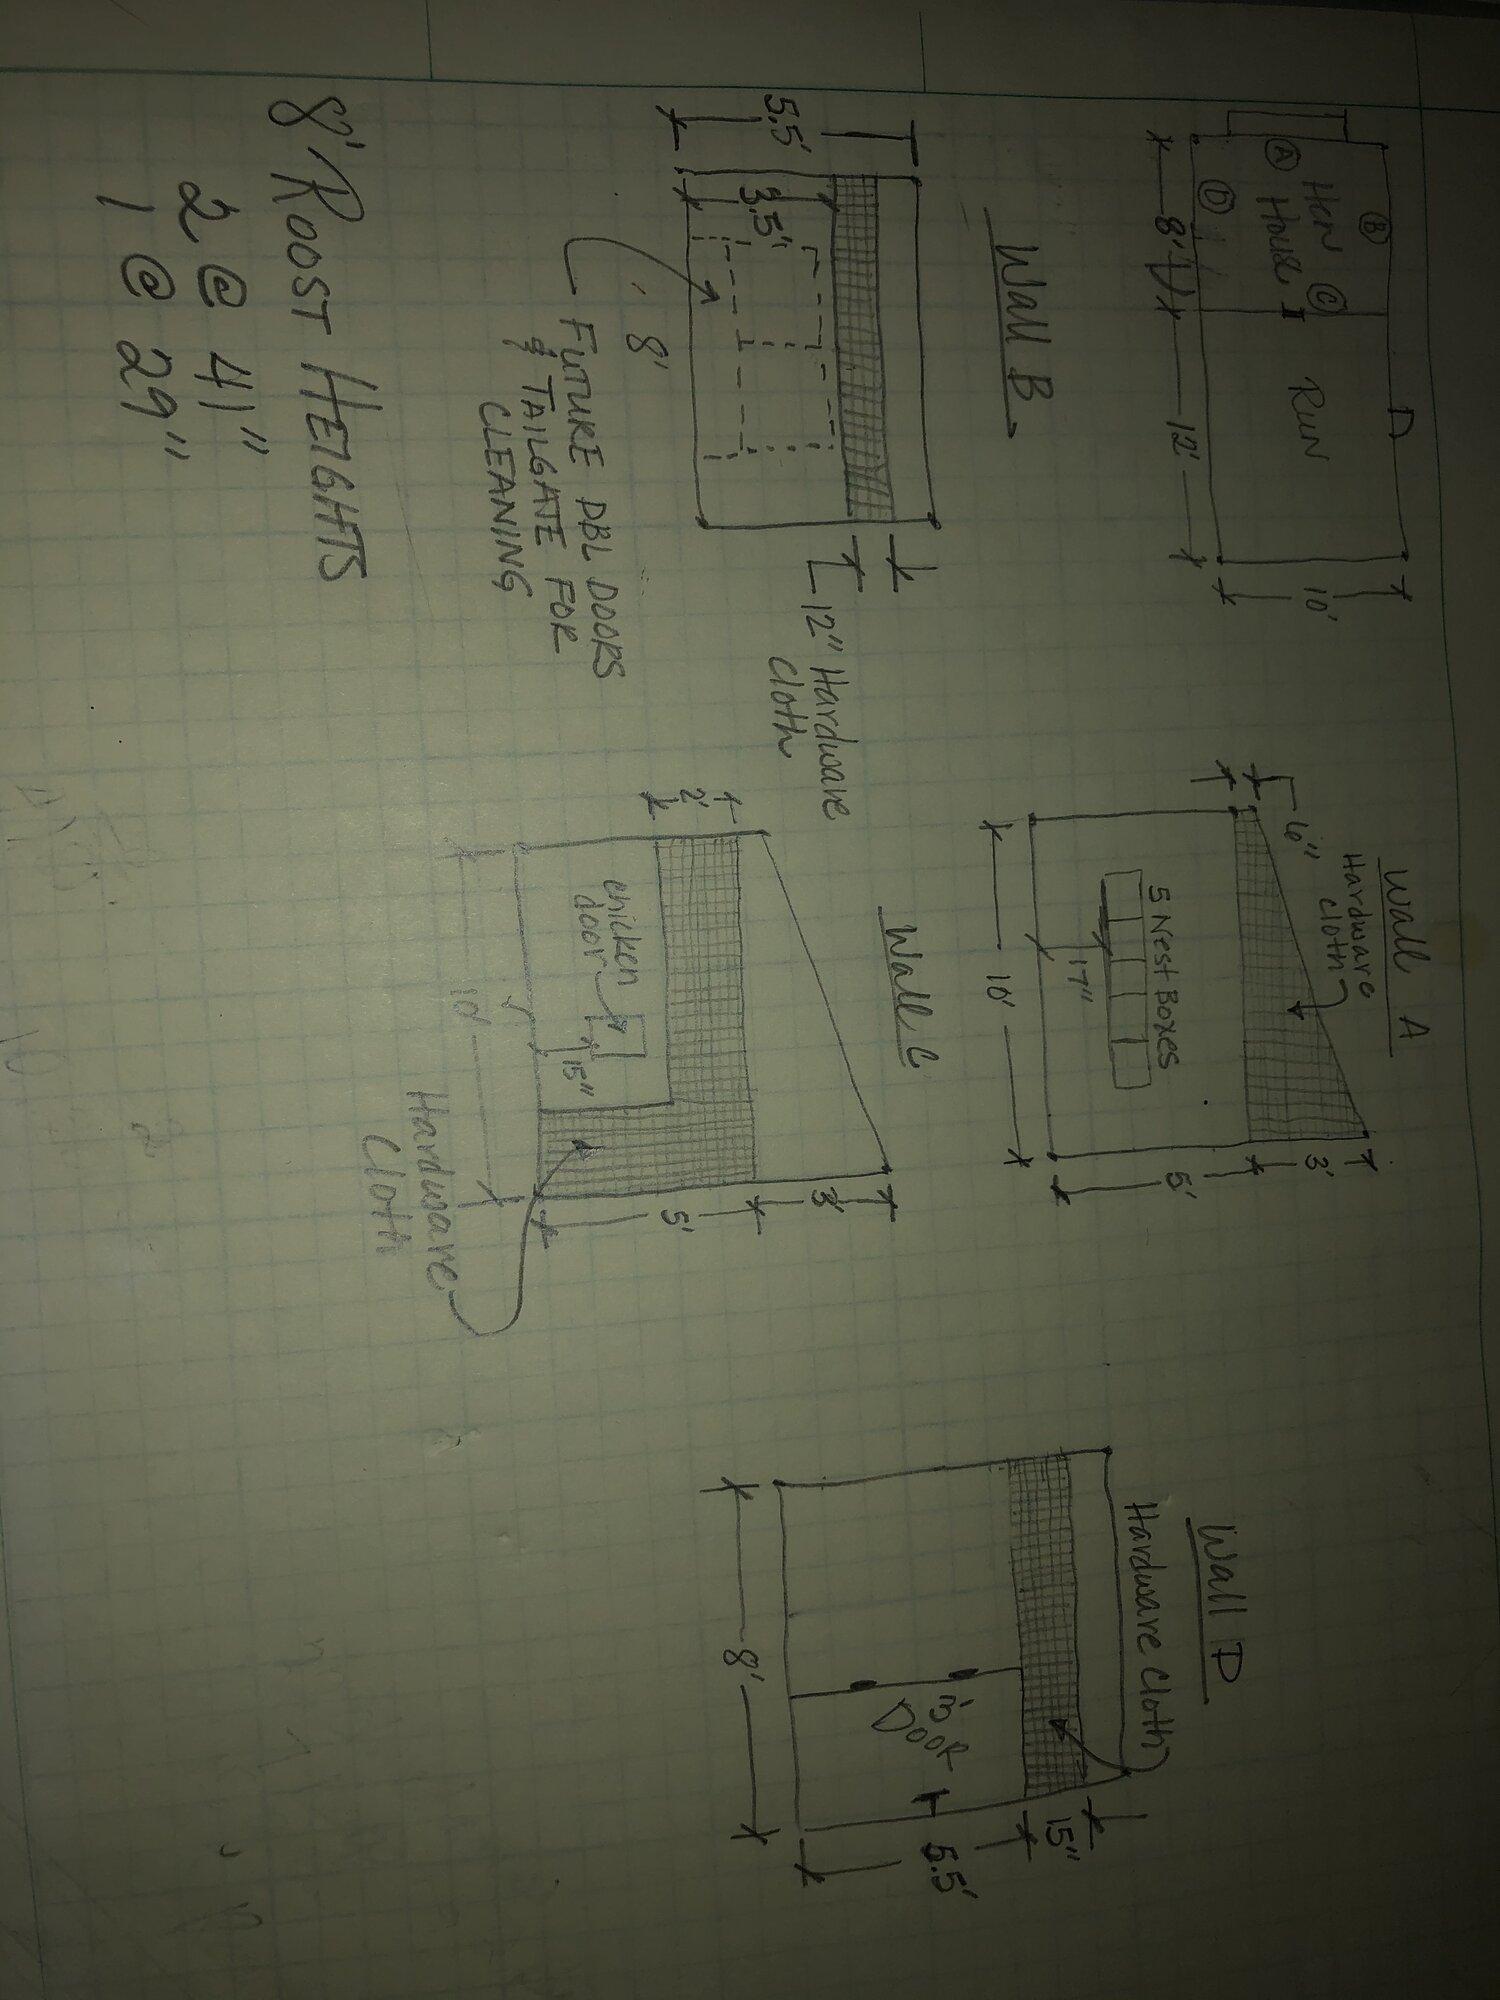 129E13ED-80BC-4CCA-ABF6-35CA11990694.jpeg